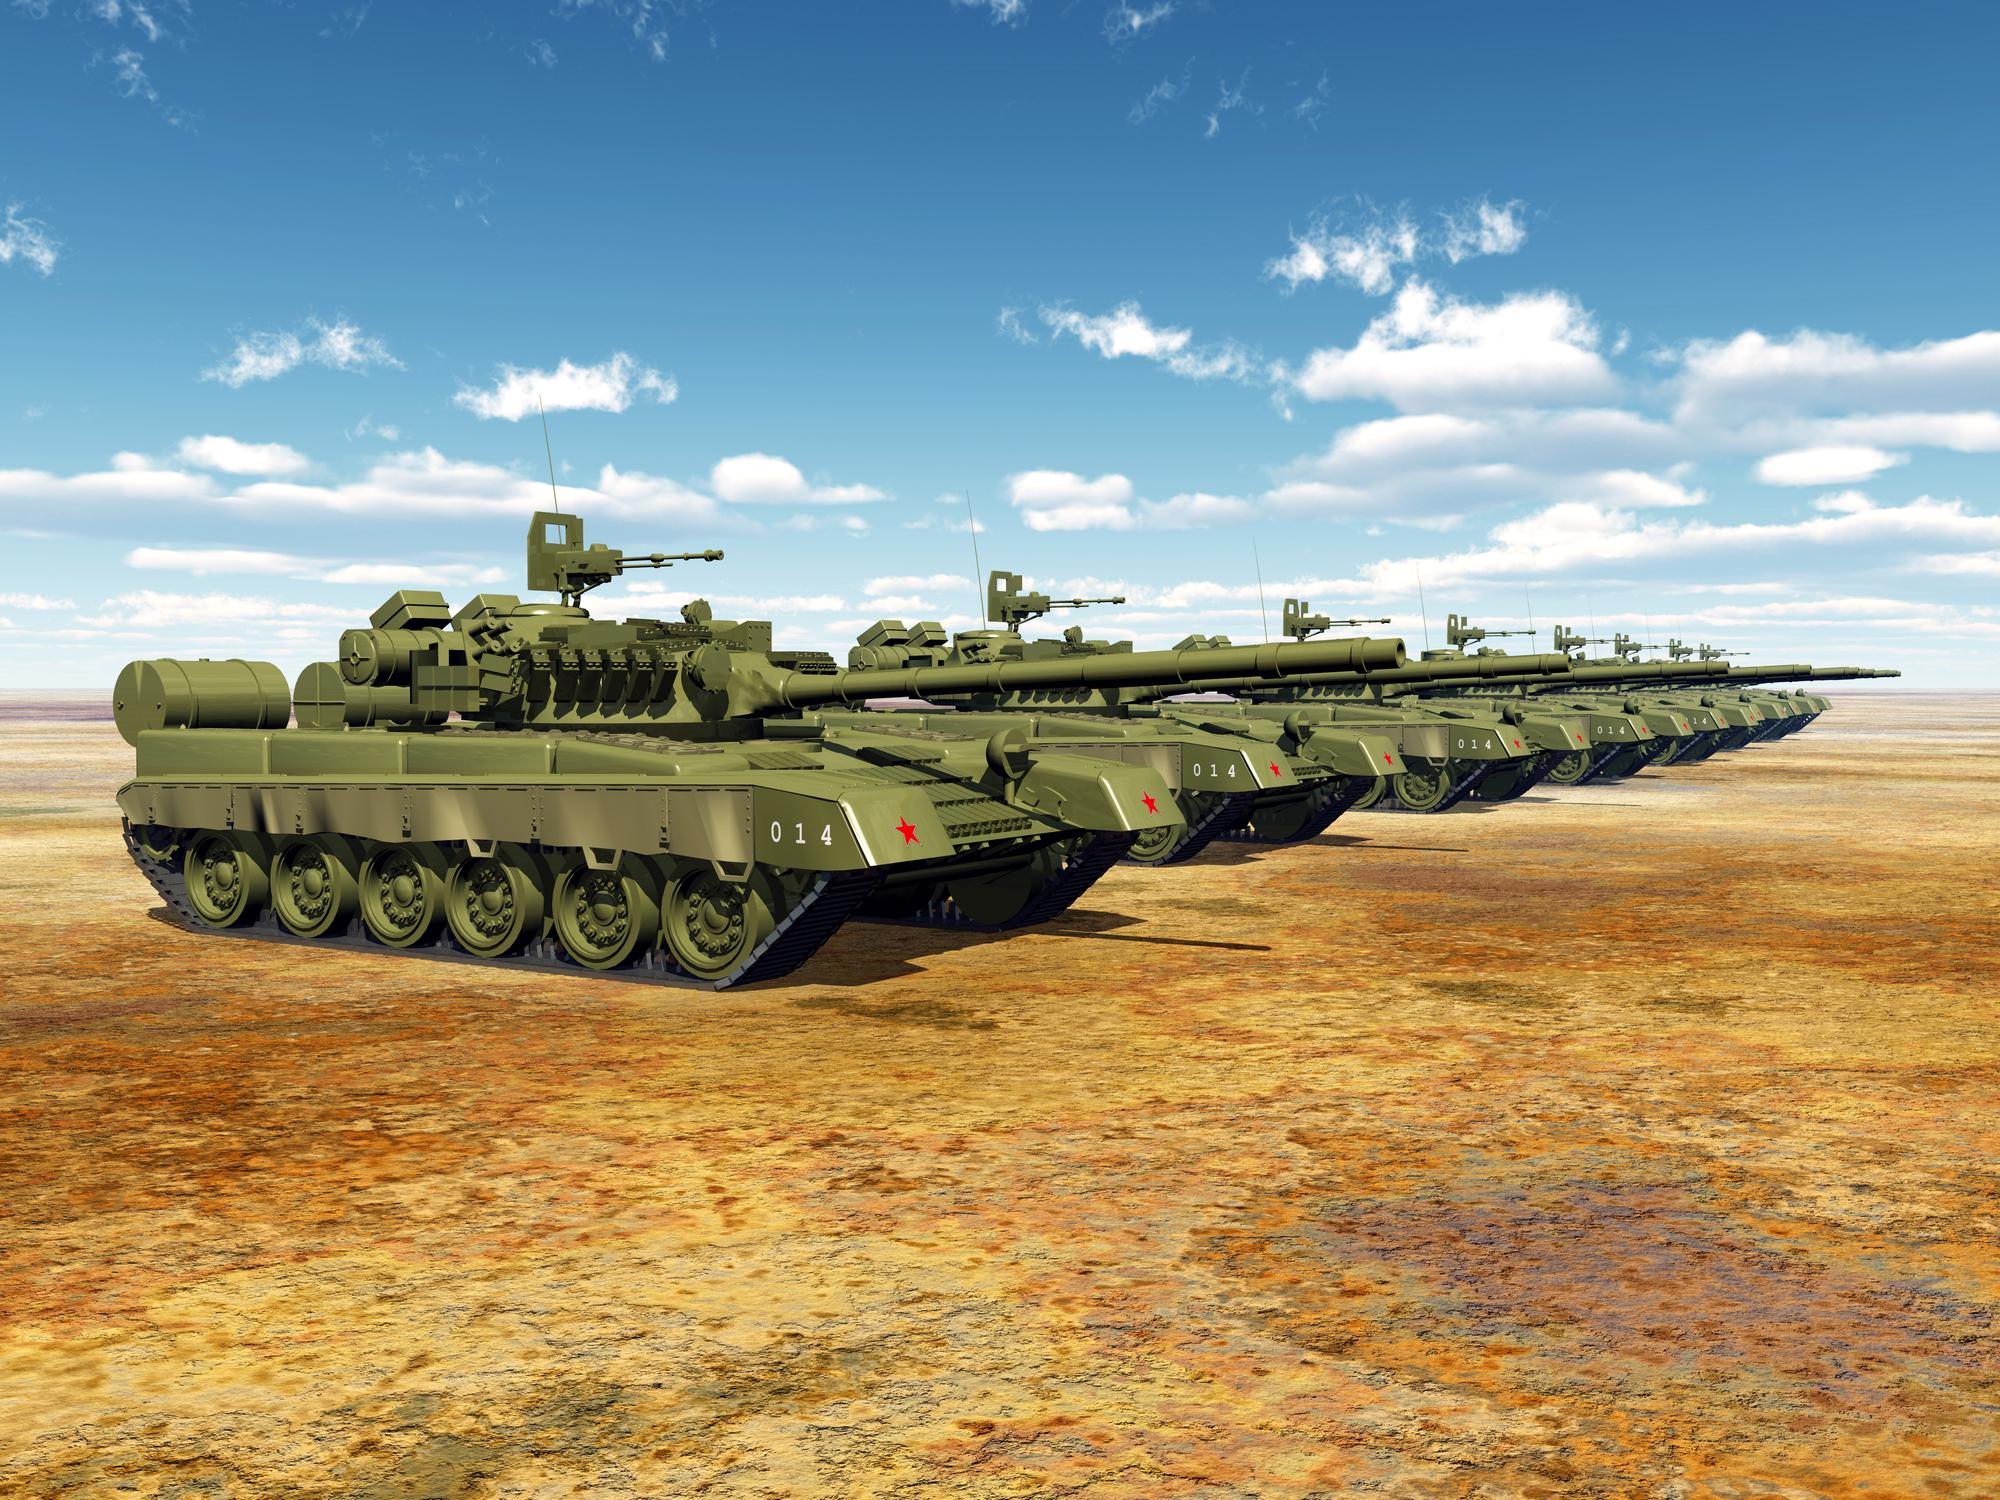 Russian main battle tanks standing in a line